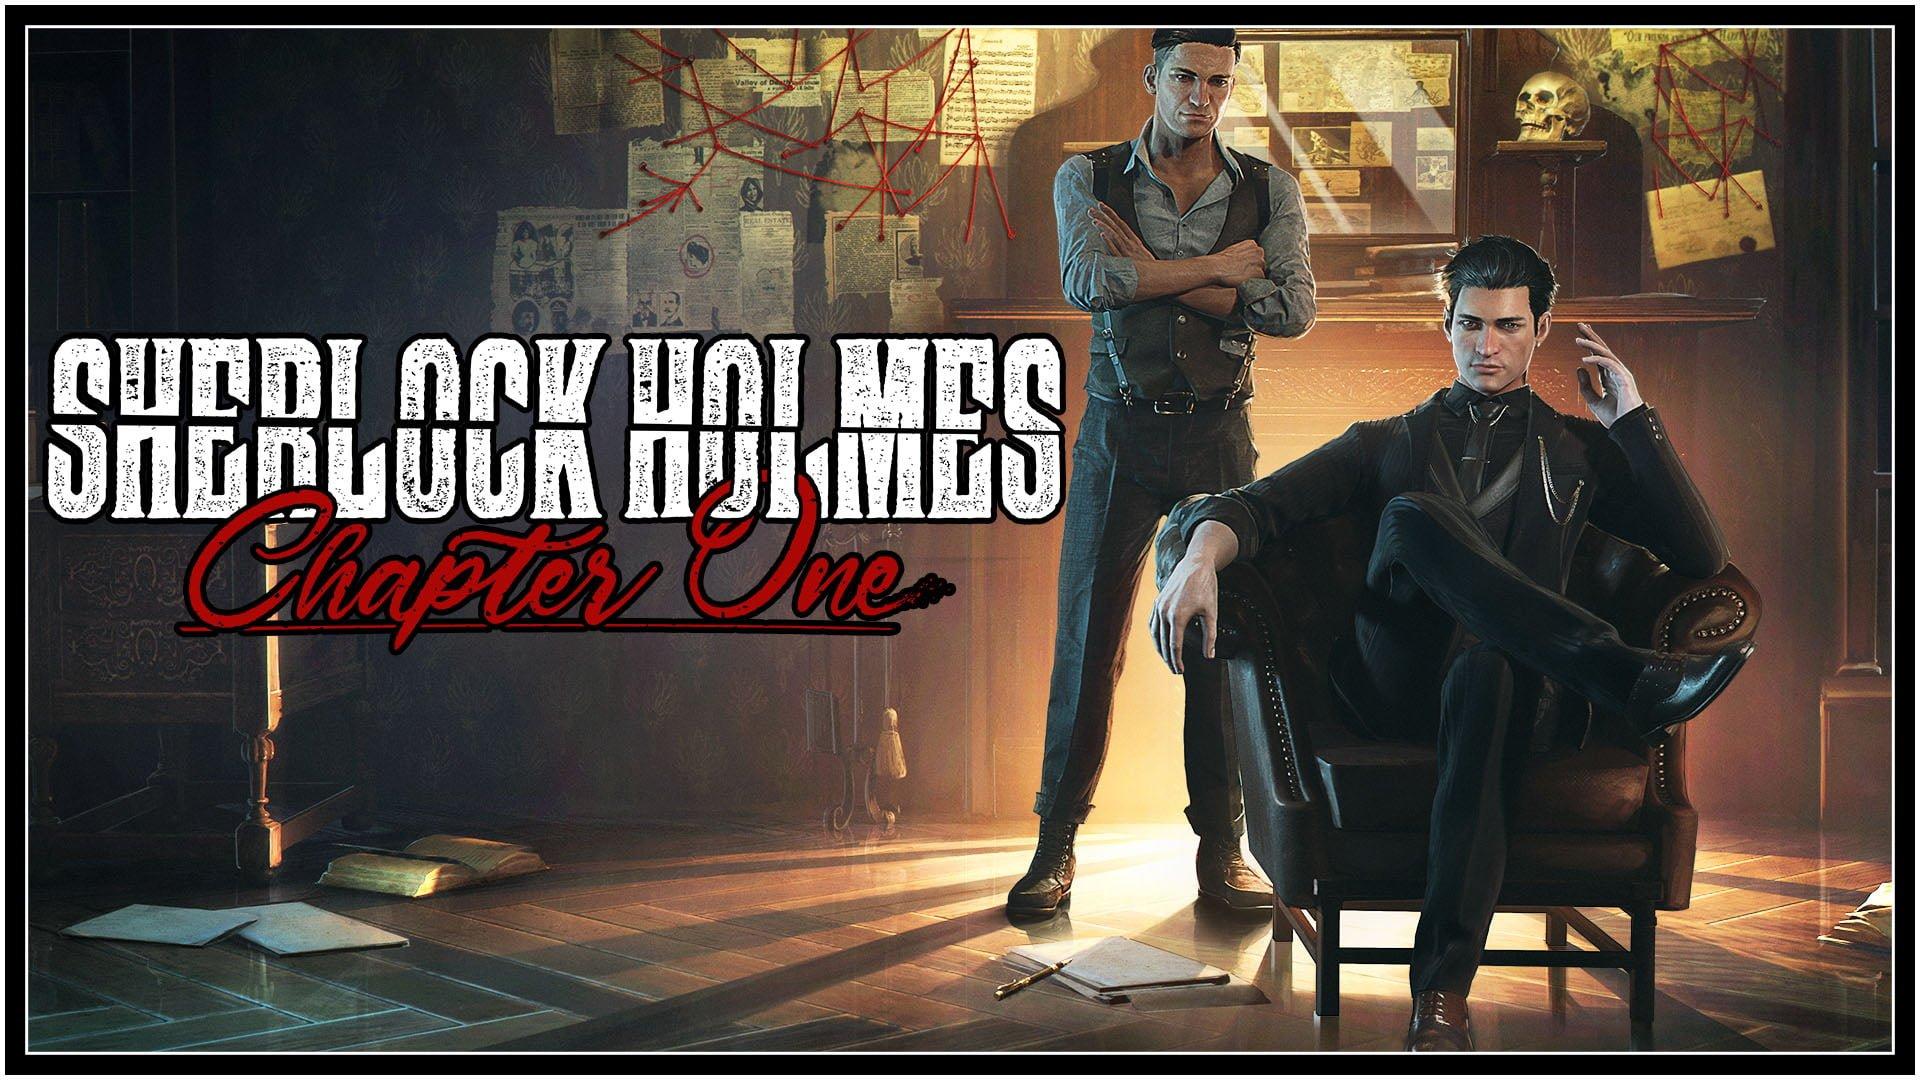 Sherlock Homes Chapter One Fi3